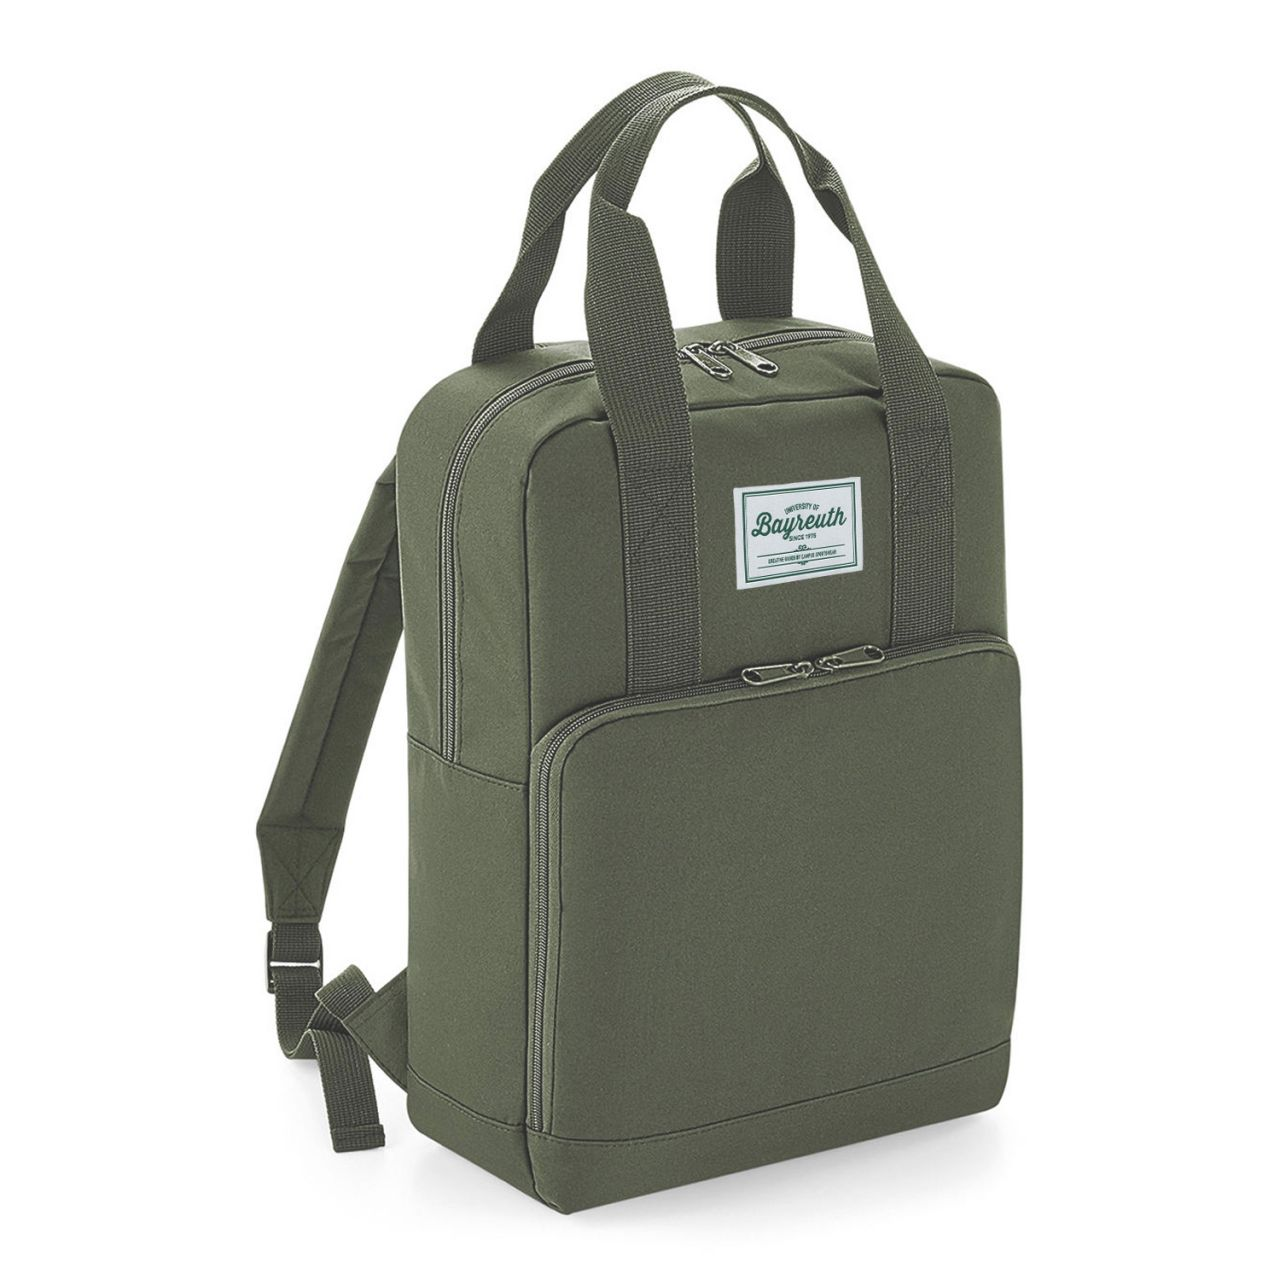 Backpack, green, label